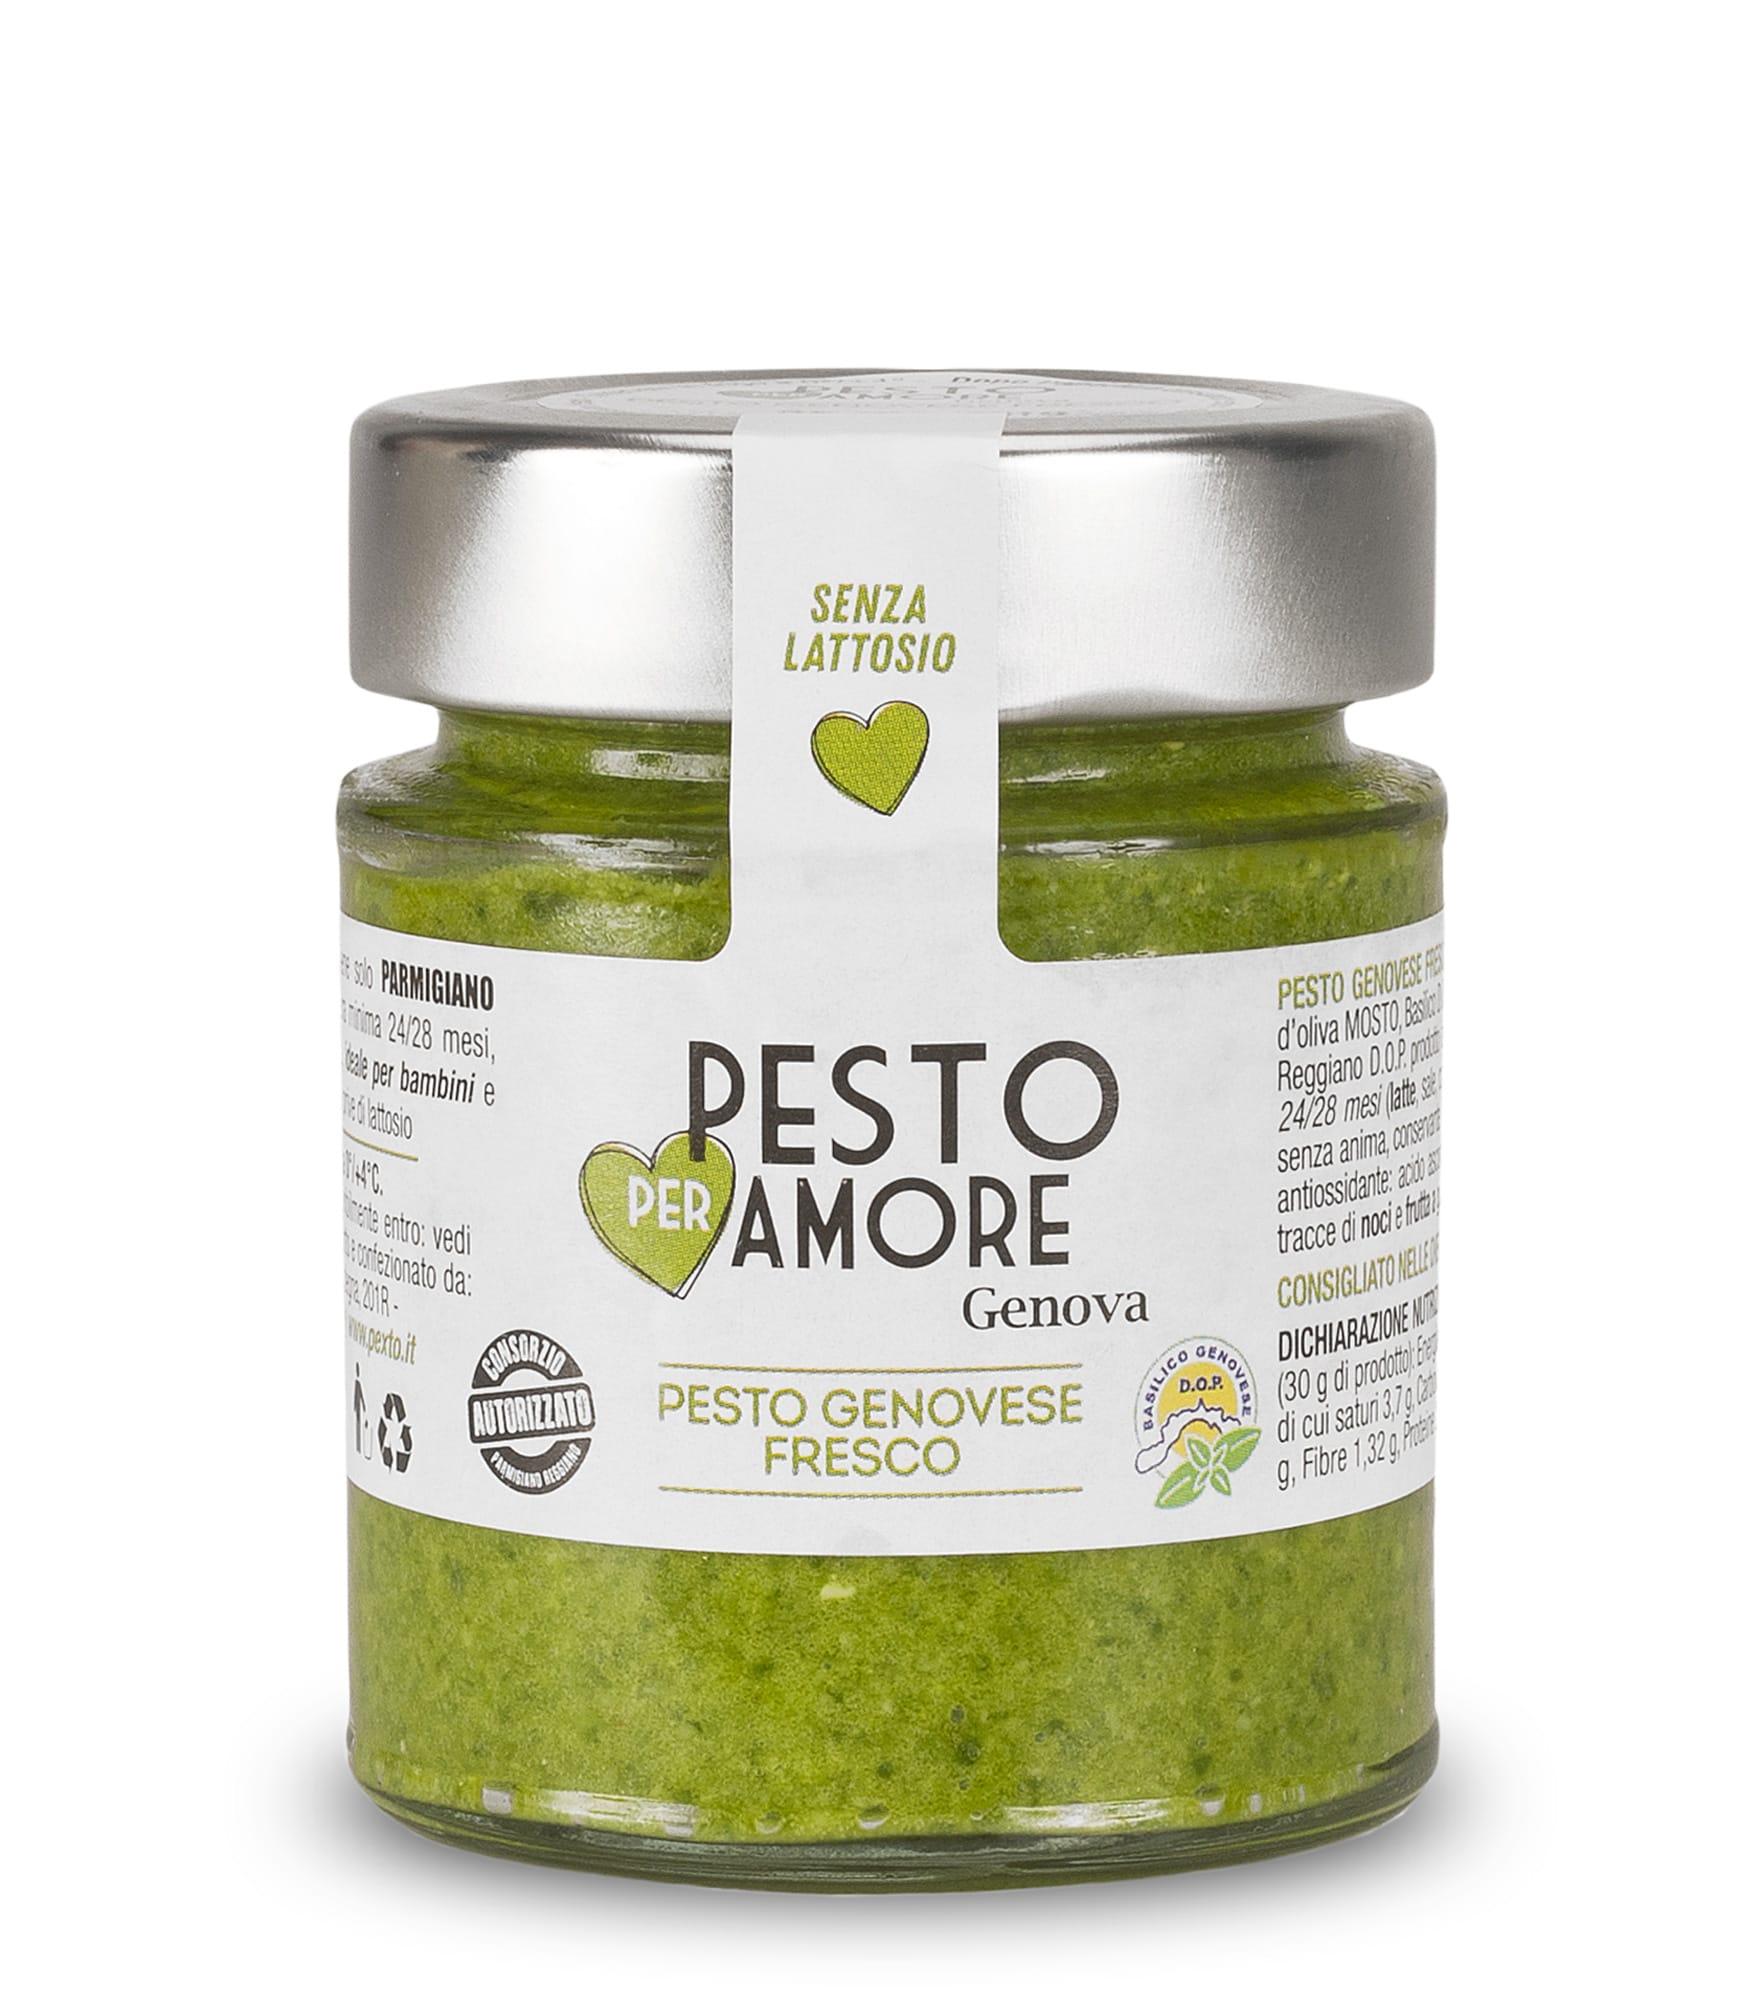 Fresch Genovese Pesto  with  parmigiano reggiano 25 months - Pexto per Amore